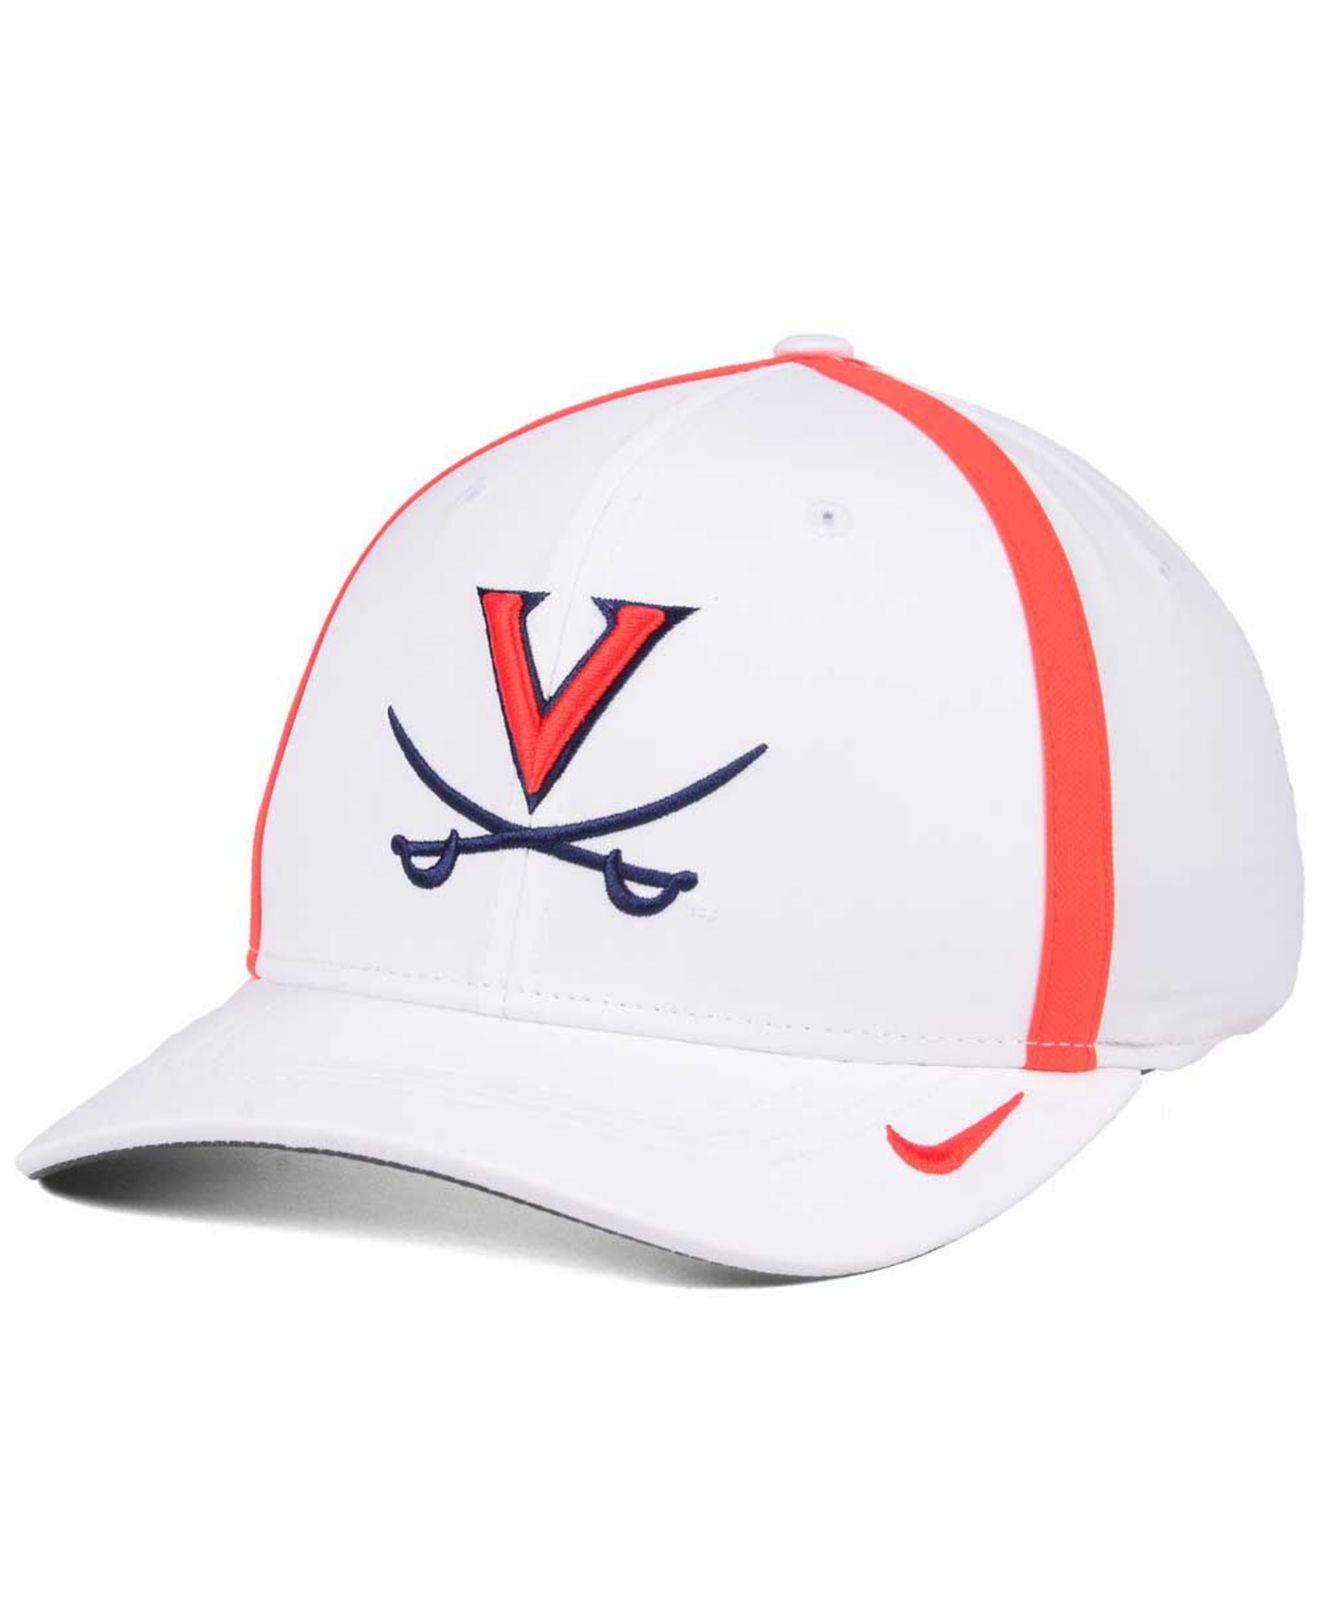 6e9f3b89cfd Lyst - Nike Aerobill Classic Sideline Swoosh Flex Cap in White for Men